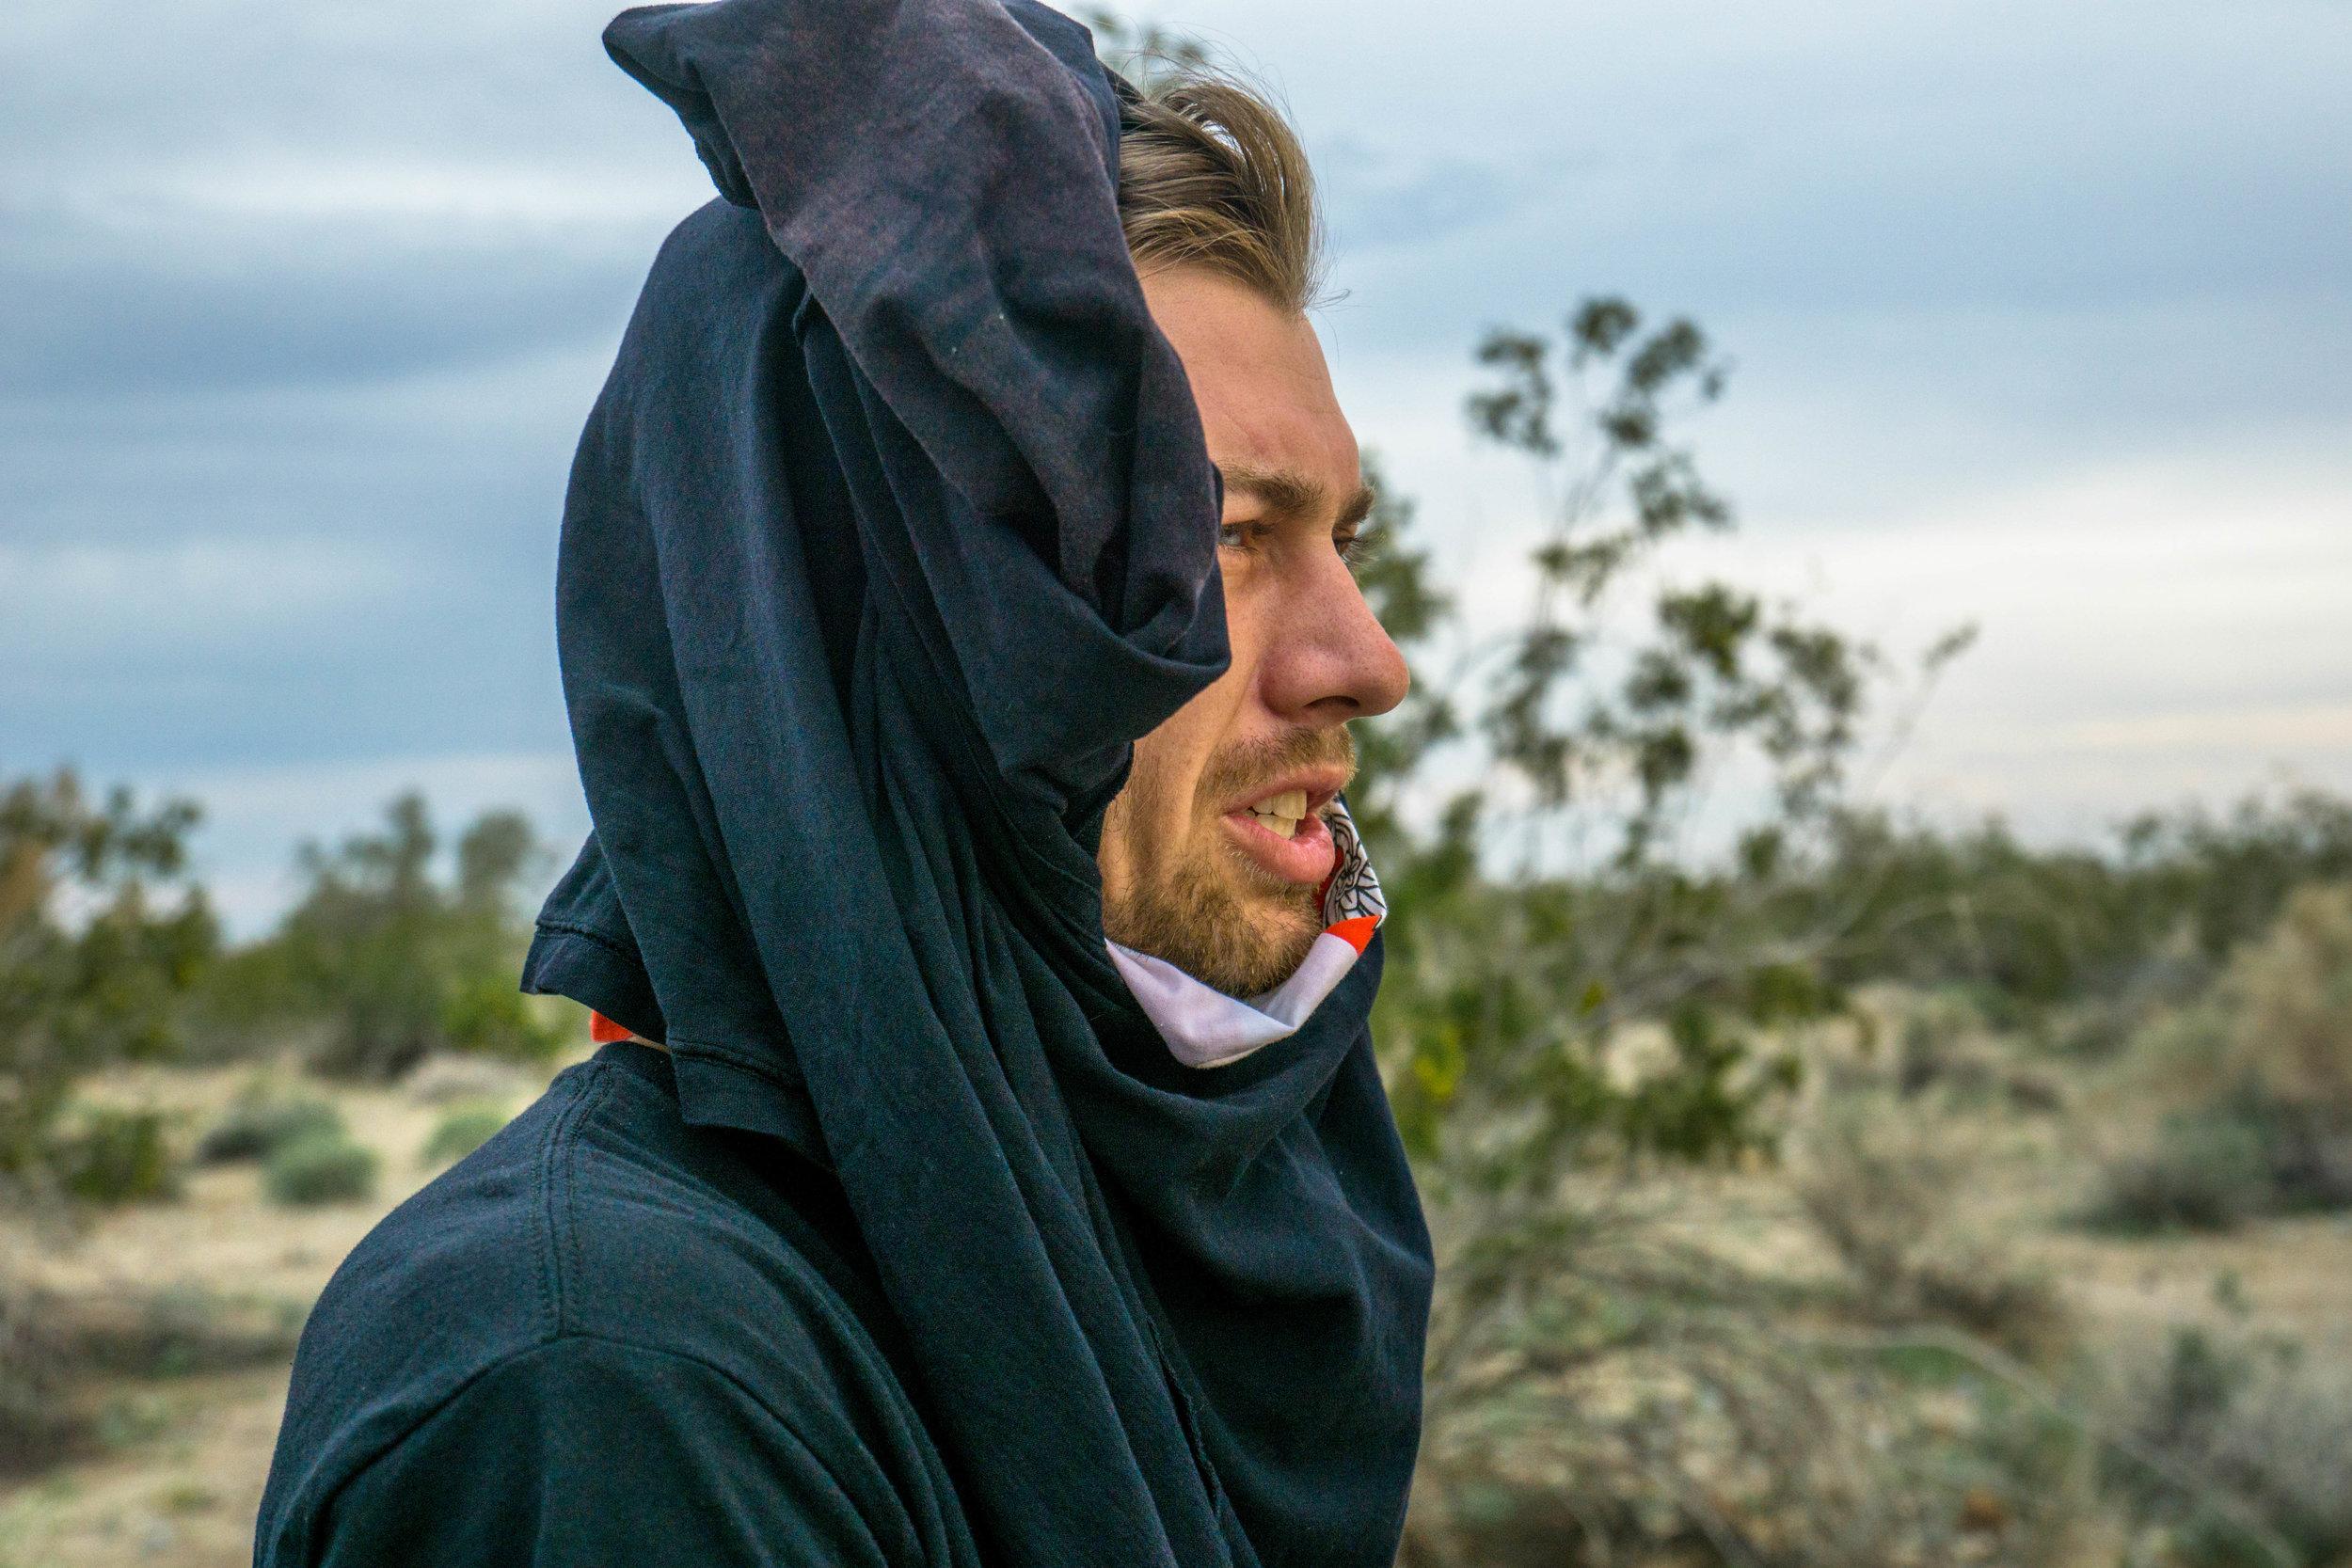 Like proper desert sultans, we wrap ourselves in garbs & make-shift headcloths.